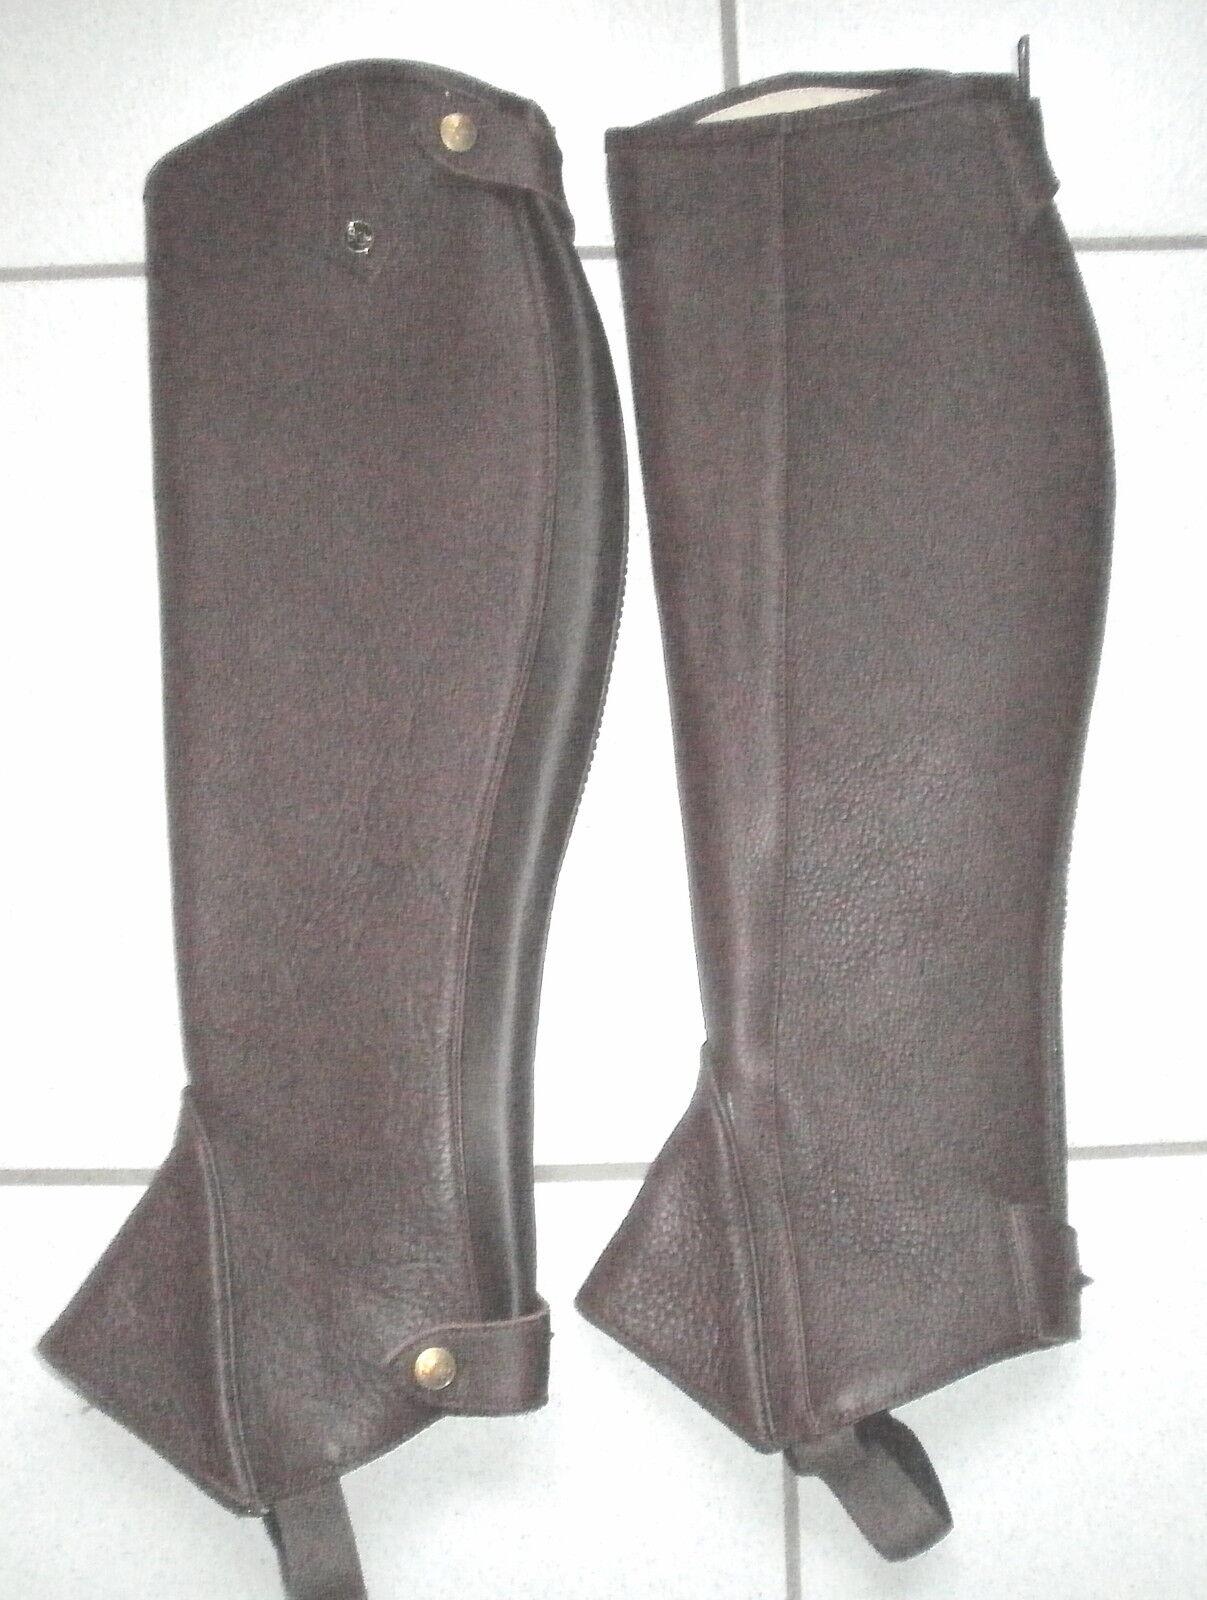 Sergio Grasso Chaps, braun, Leather Patterned, Größe S,